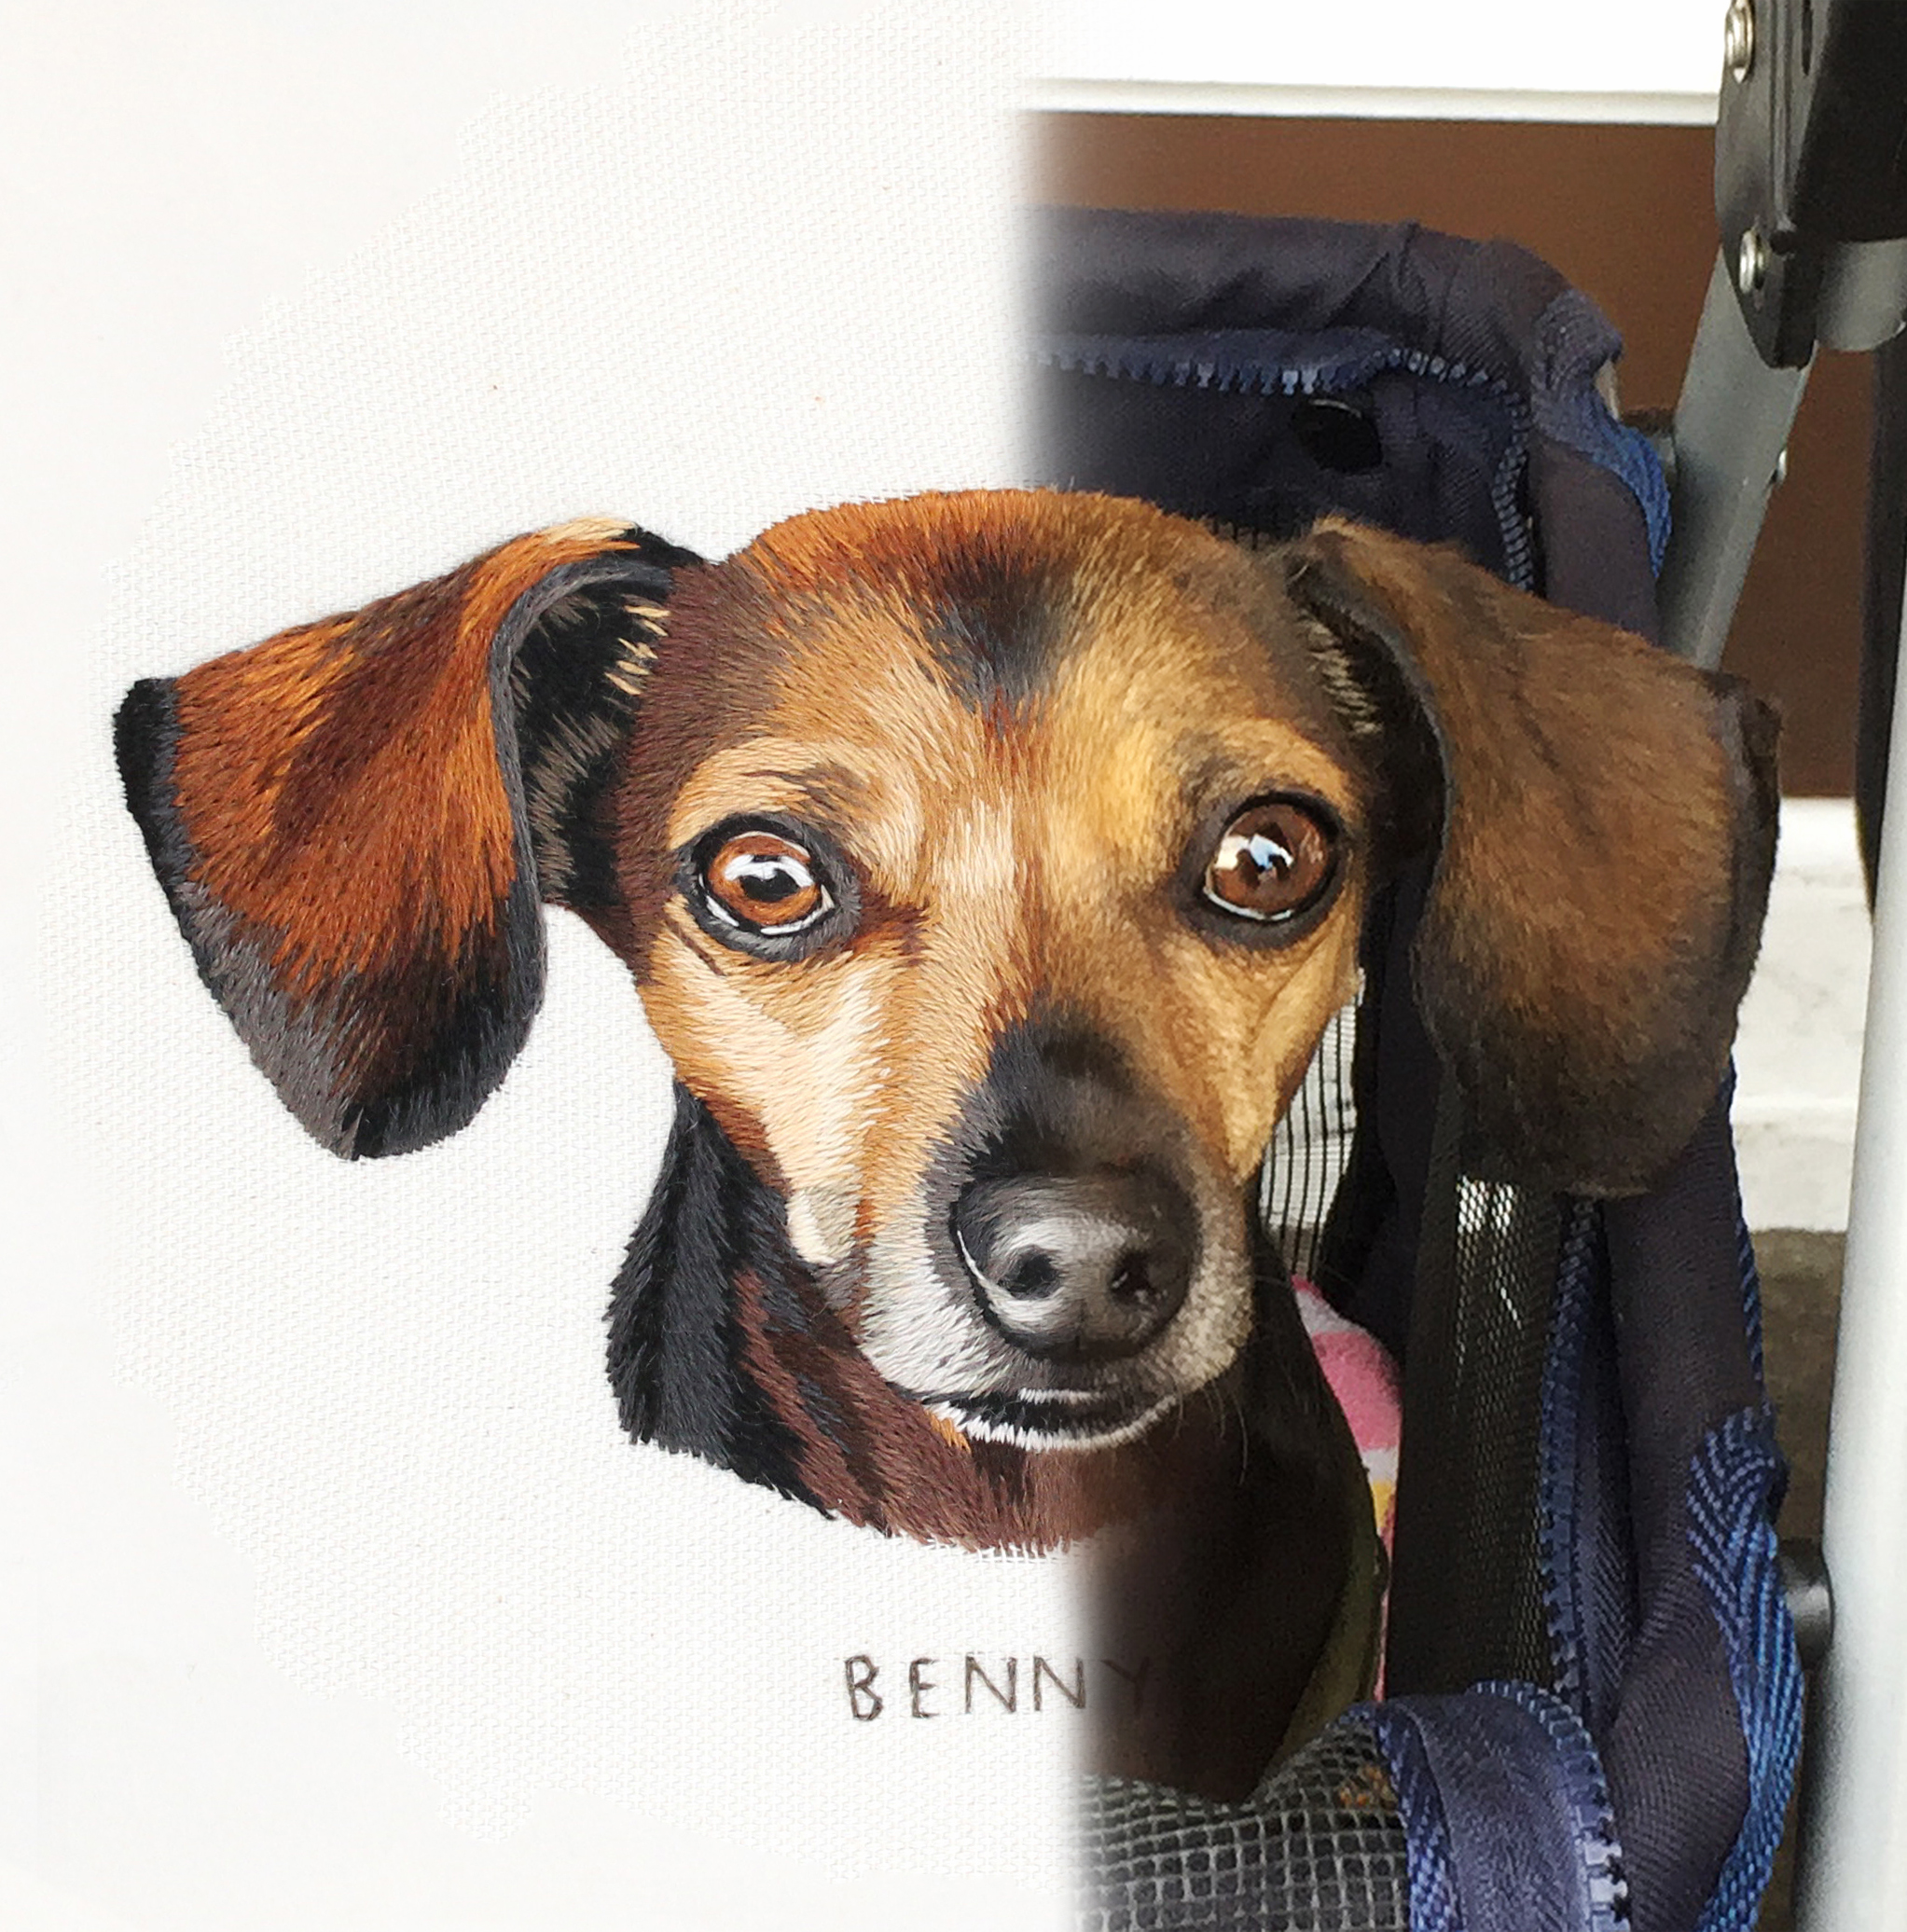 Benny_custom_pet_portrait_threadpainting_needlepainting_silkshading_embroidery_by_emillie_ferris_.jpg